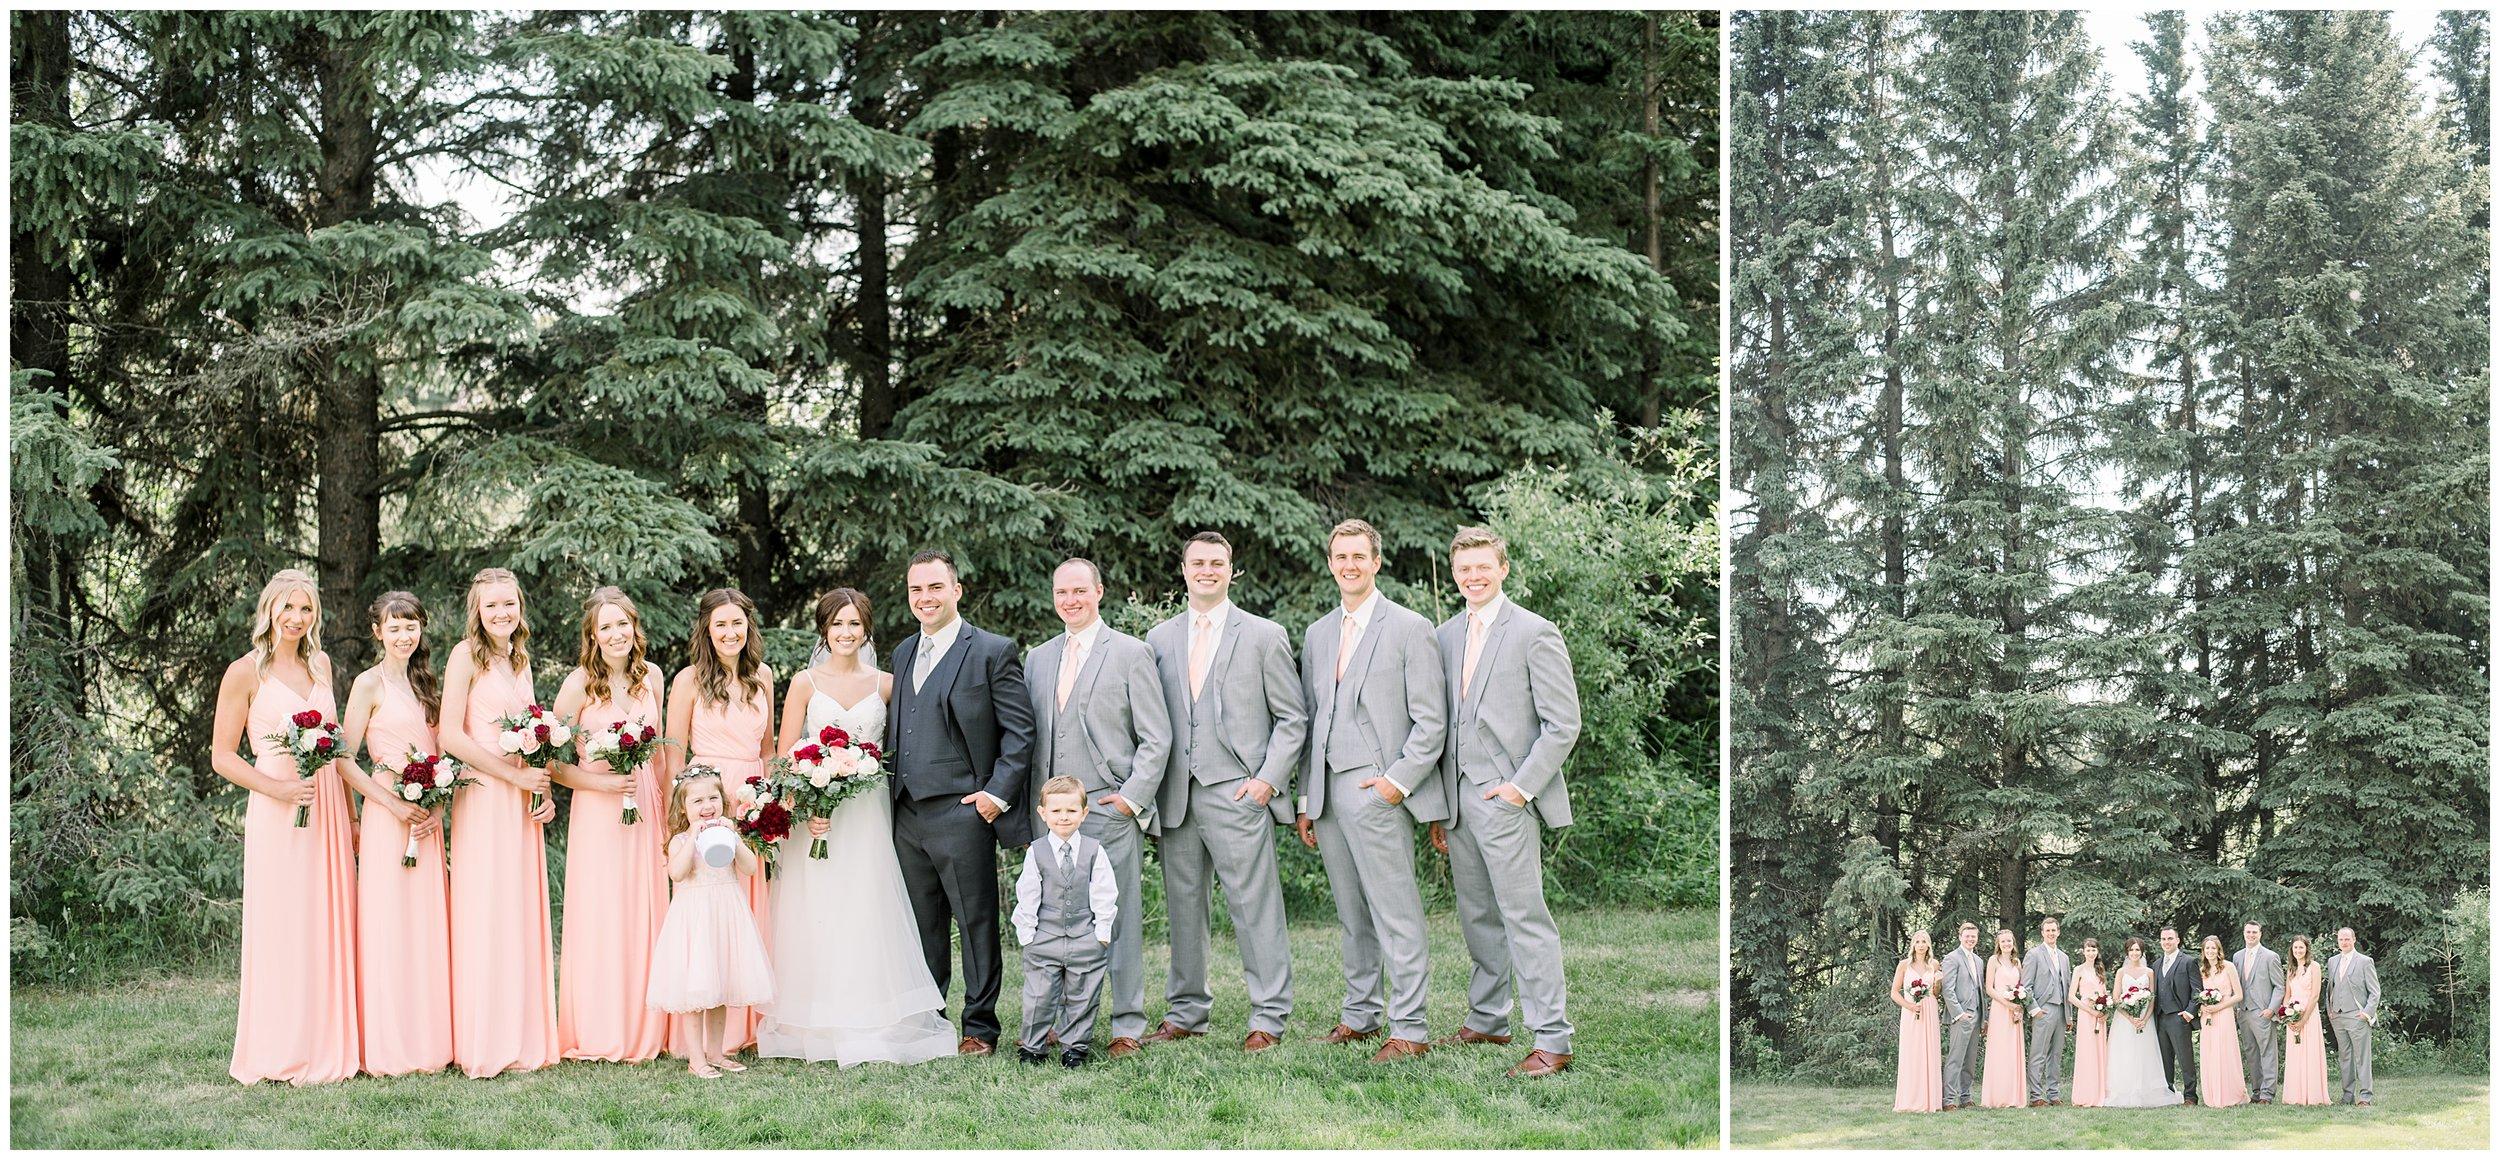 Alyssa-Poland-Photography_0624_alberta wedding.jpg